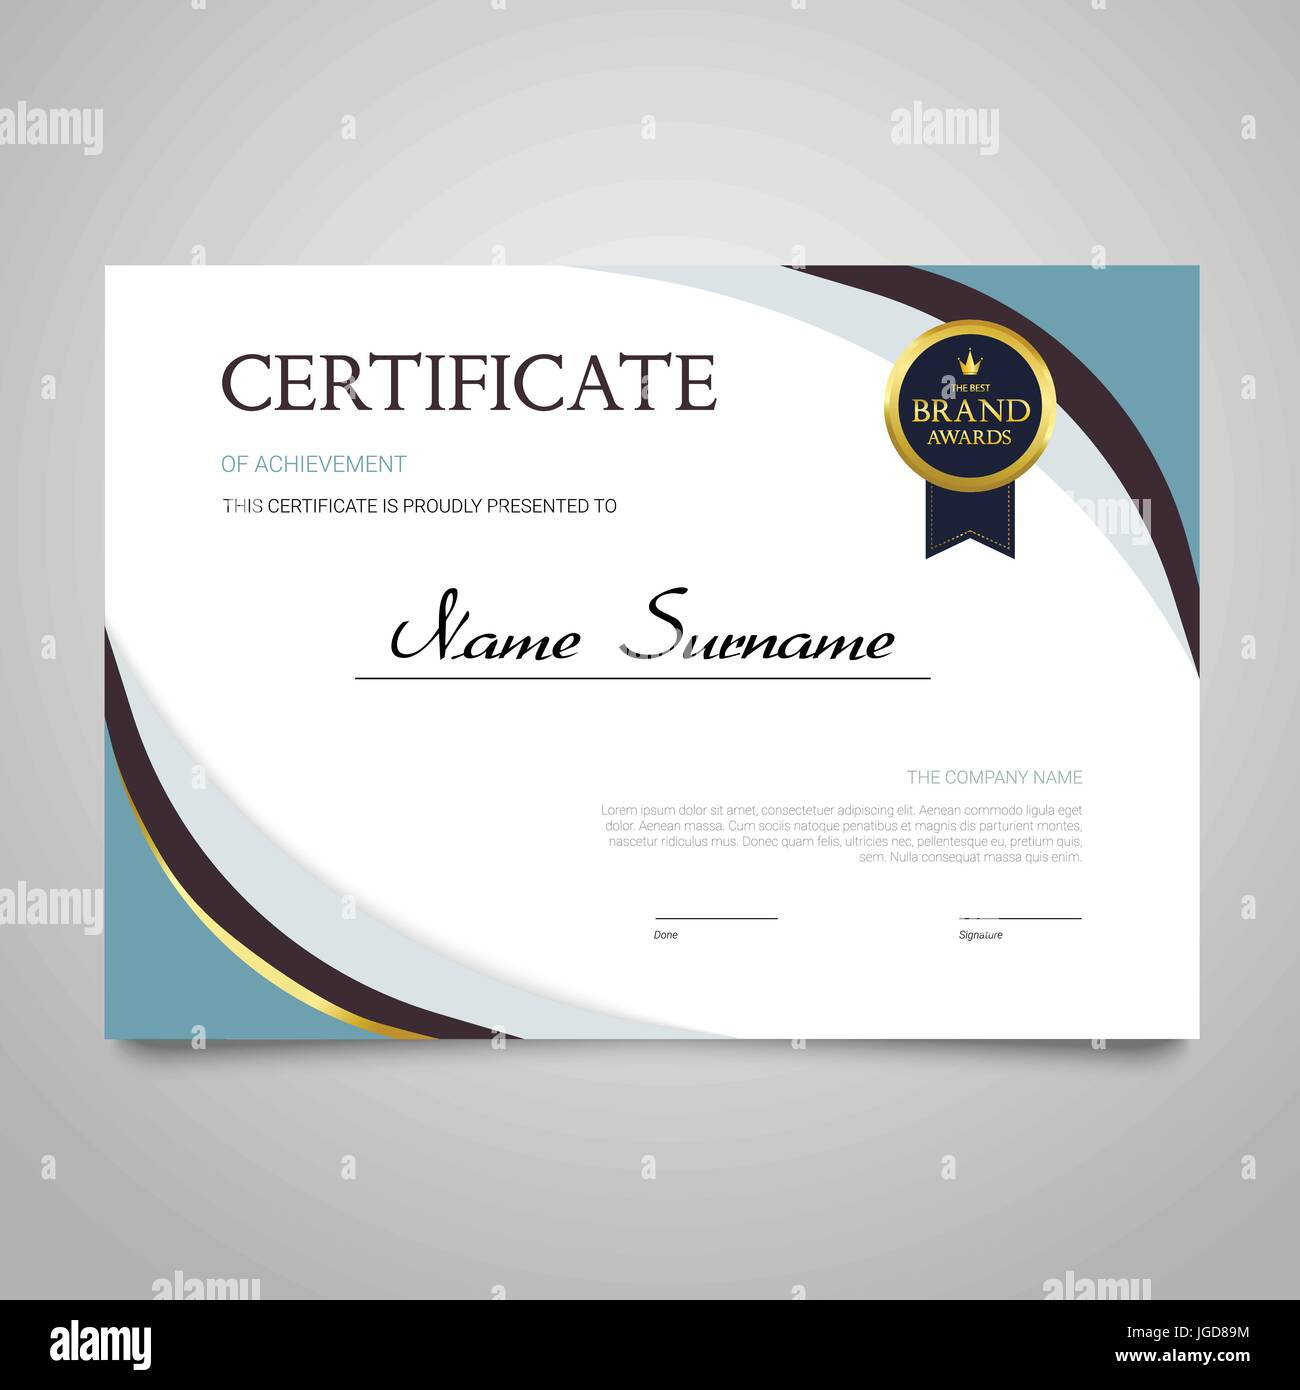 Zertifikat - moderne horizontale elegante Vektor Dokument mit Luxus ...